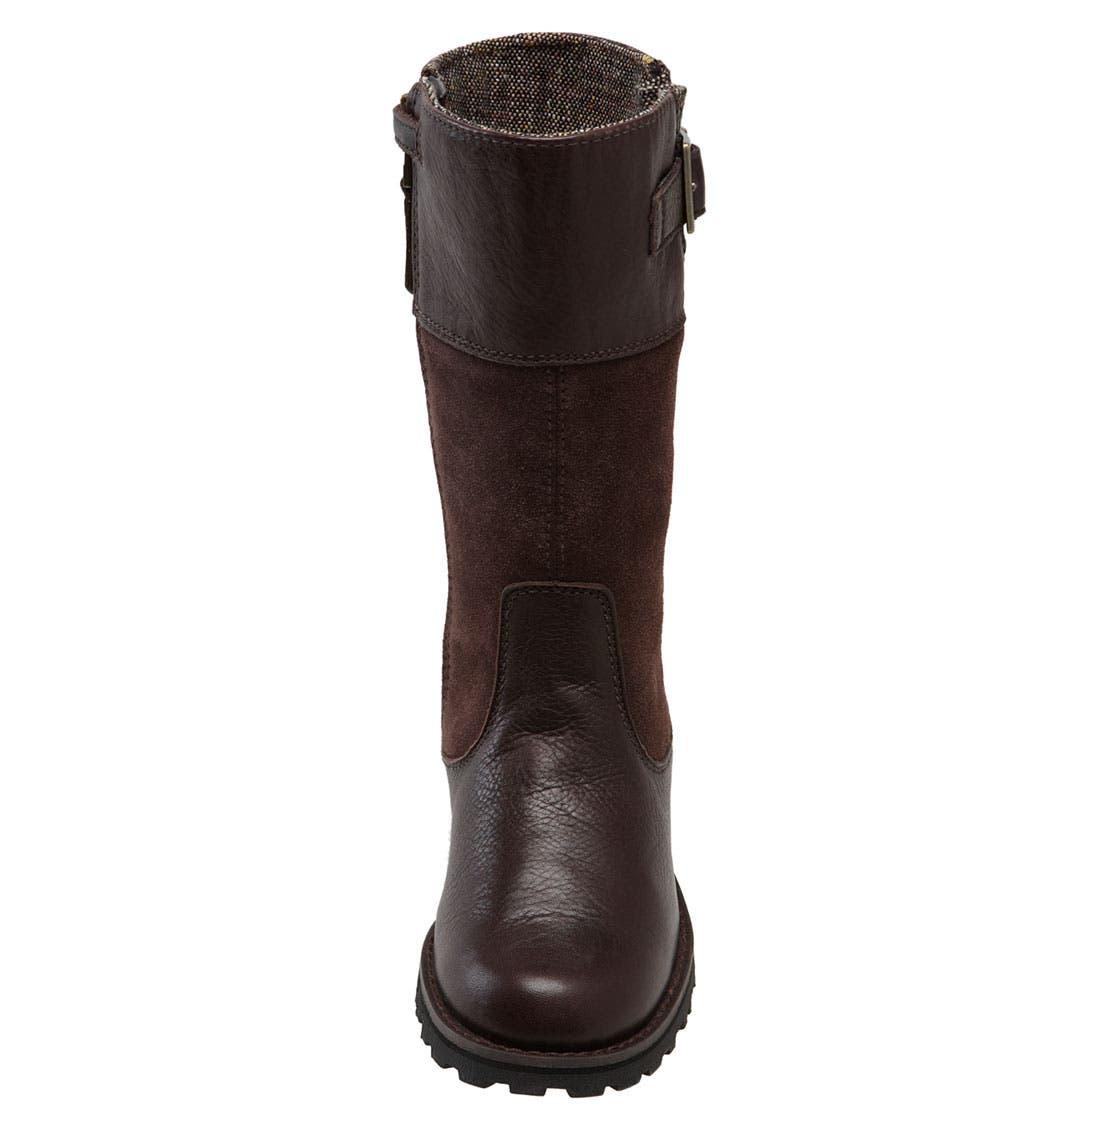 Alternate Image 3  - Timberland 'Maplebrook' Tall Boot (Walker, Toddler, Little Kid & Big Kid)